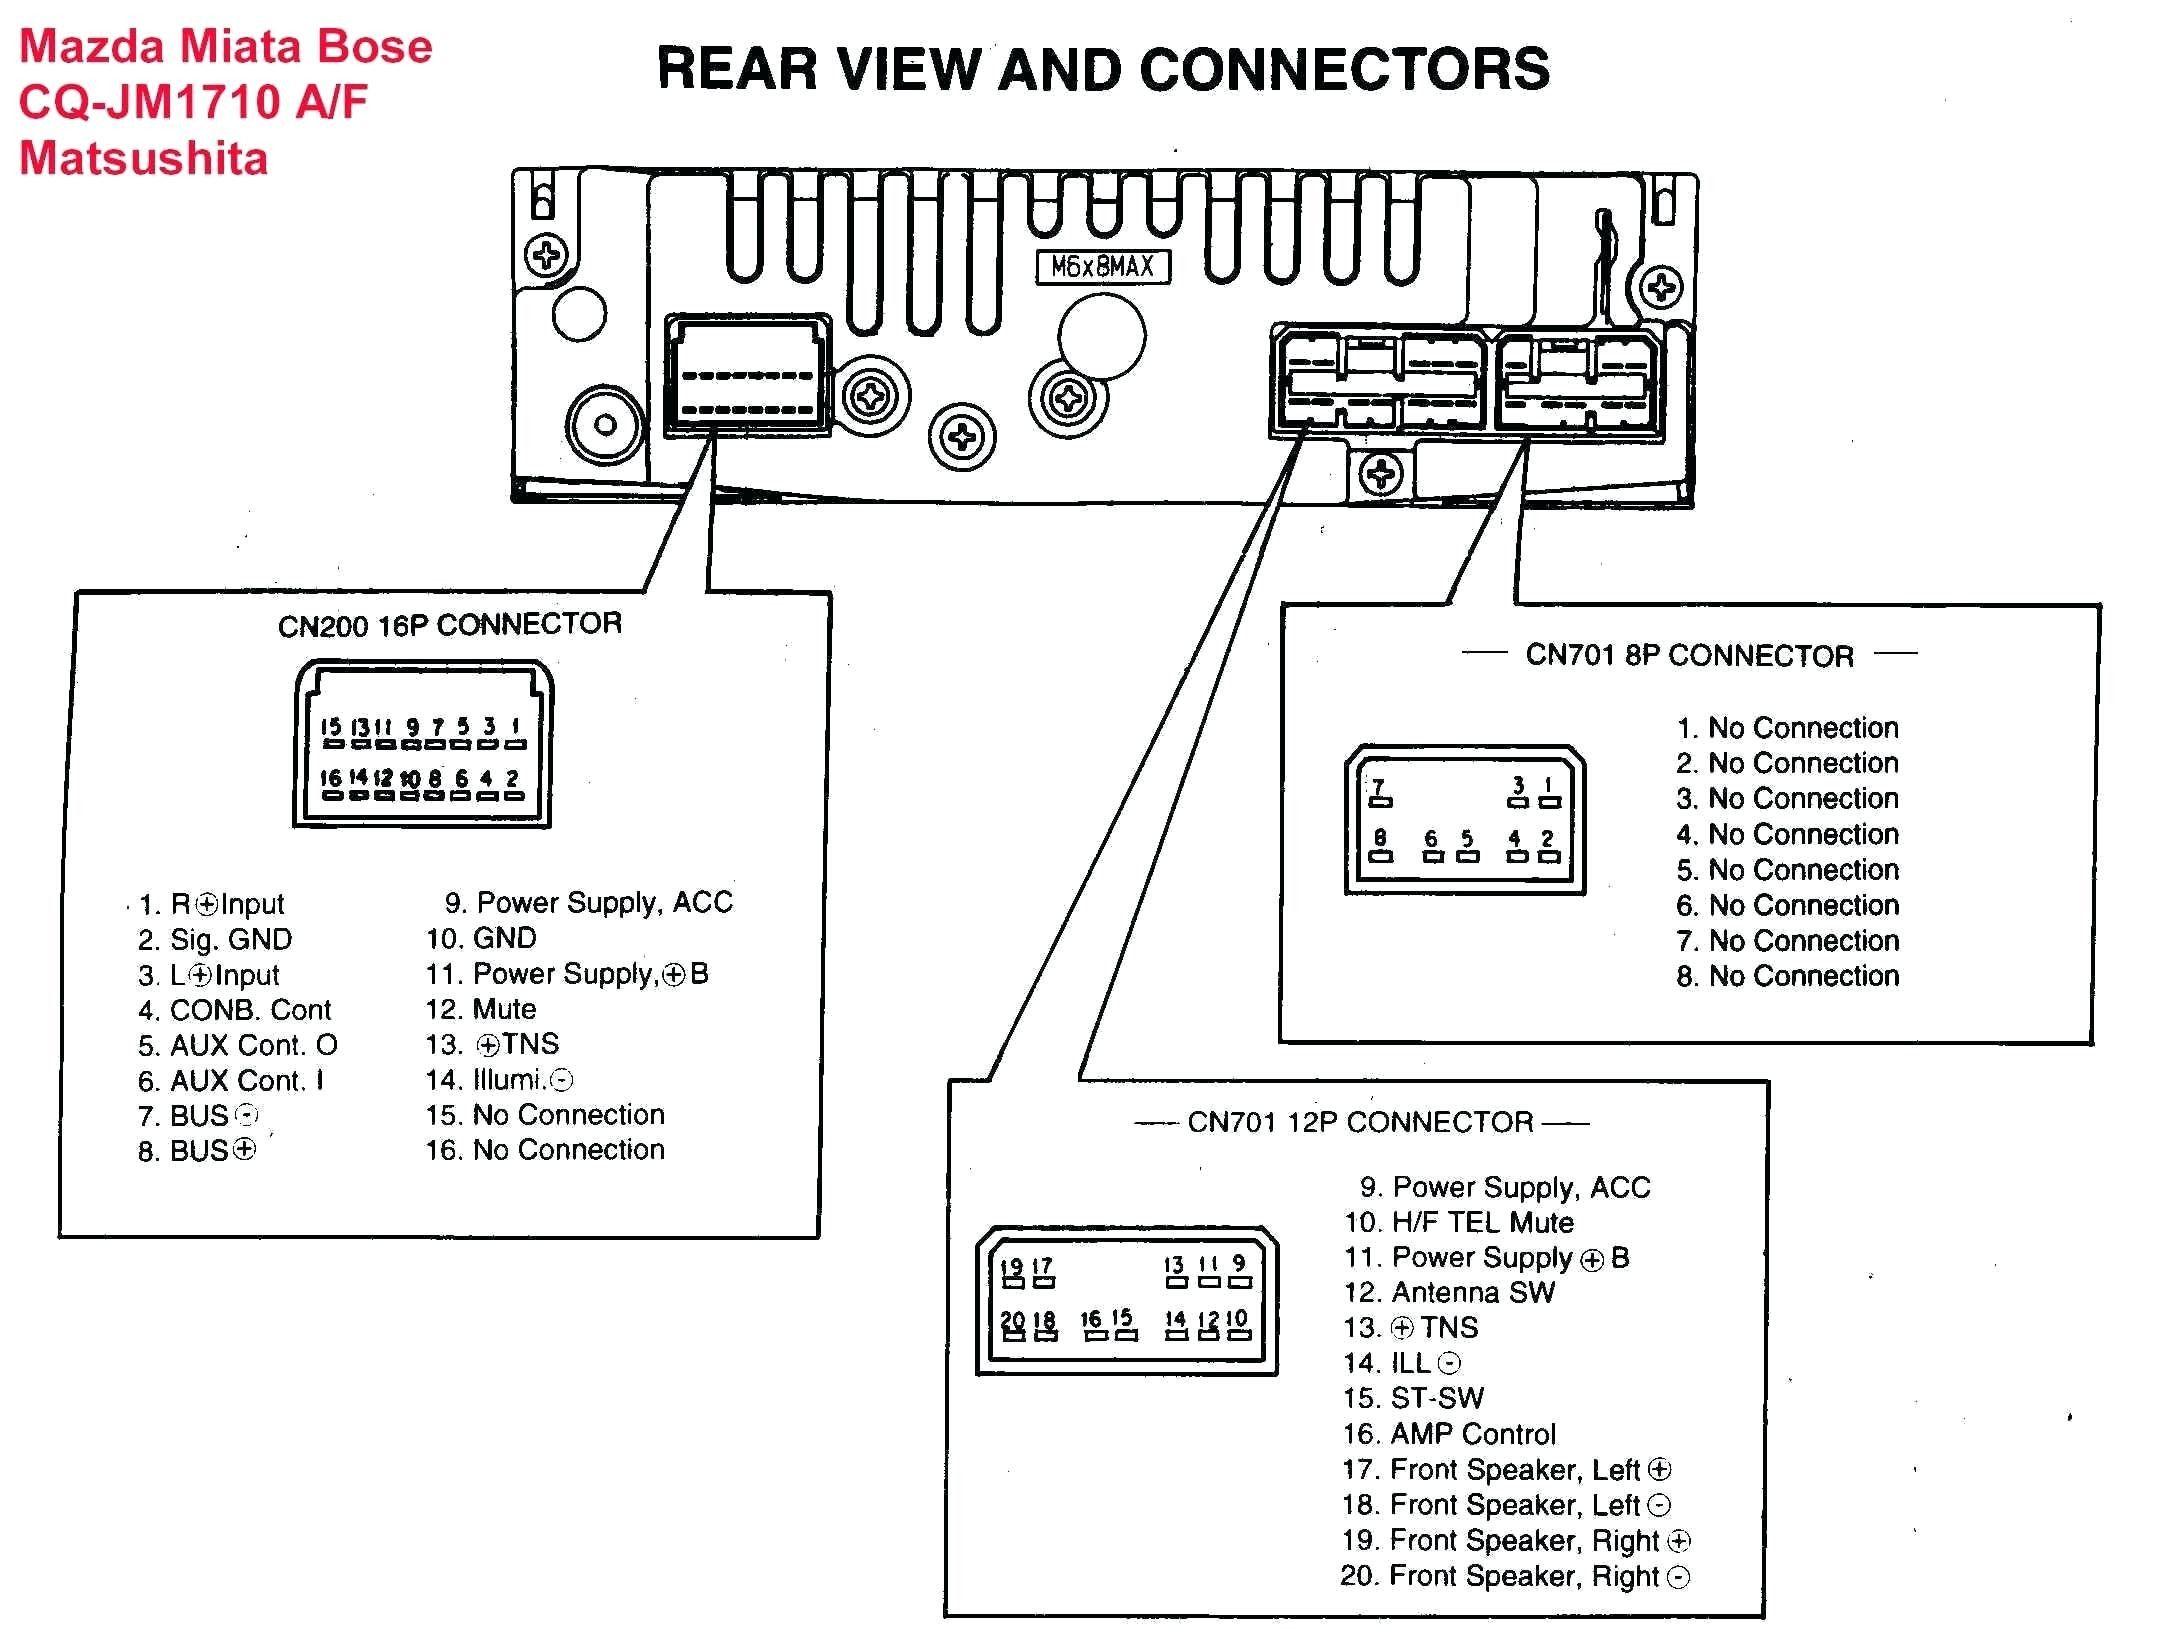 Unique Wiring Diagram sony Car Stereo Mazda, Bose